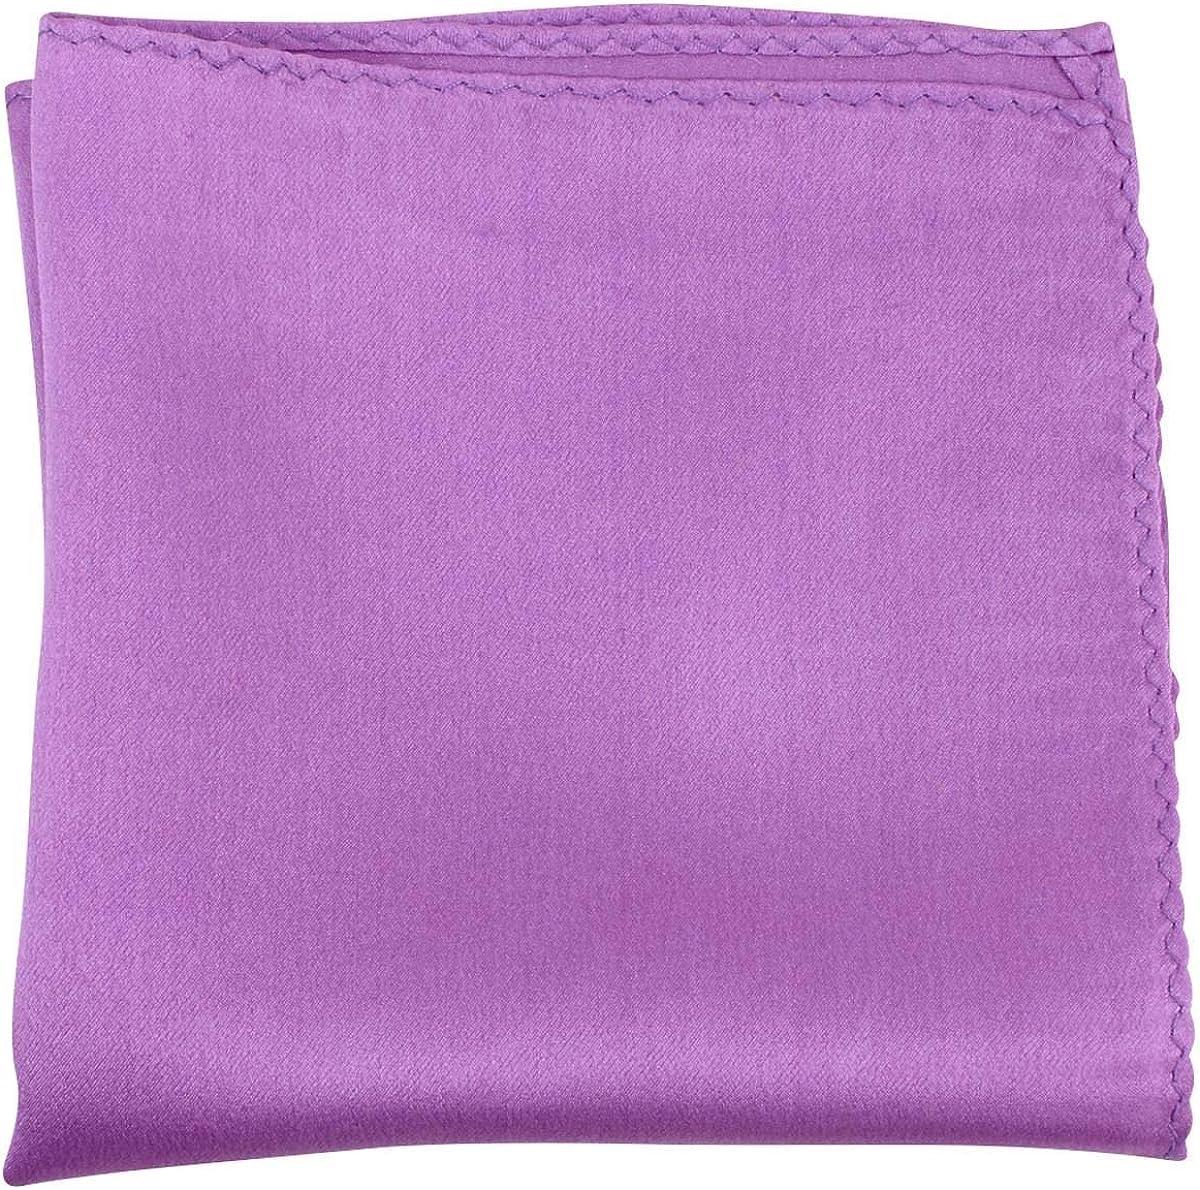 Knightsbridge Neckwear Mens Fine Silk Pocket Square - Deep Lilac